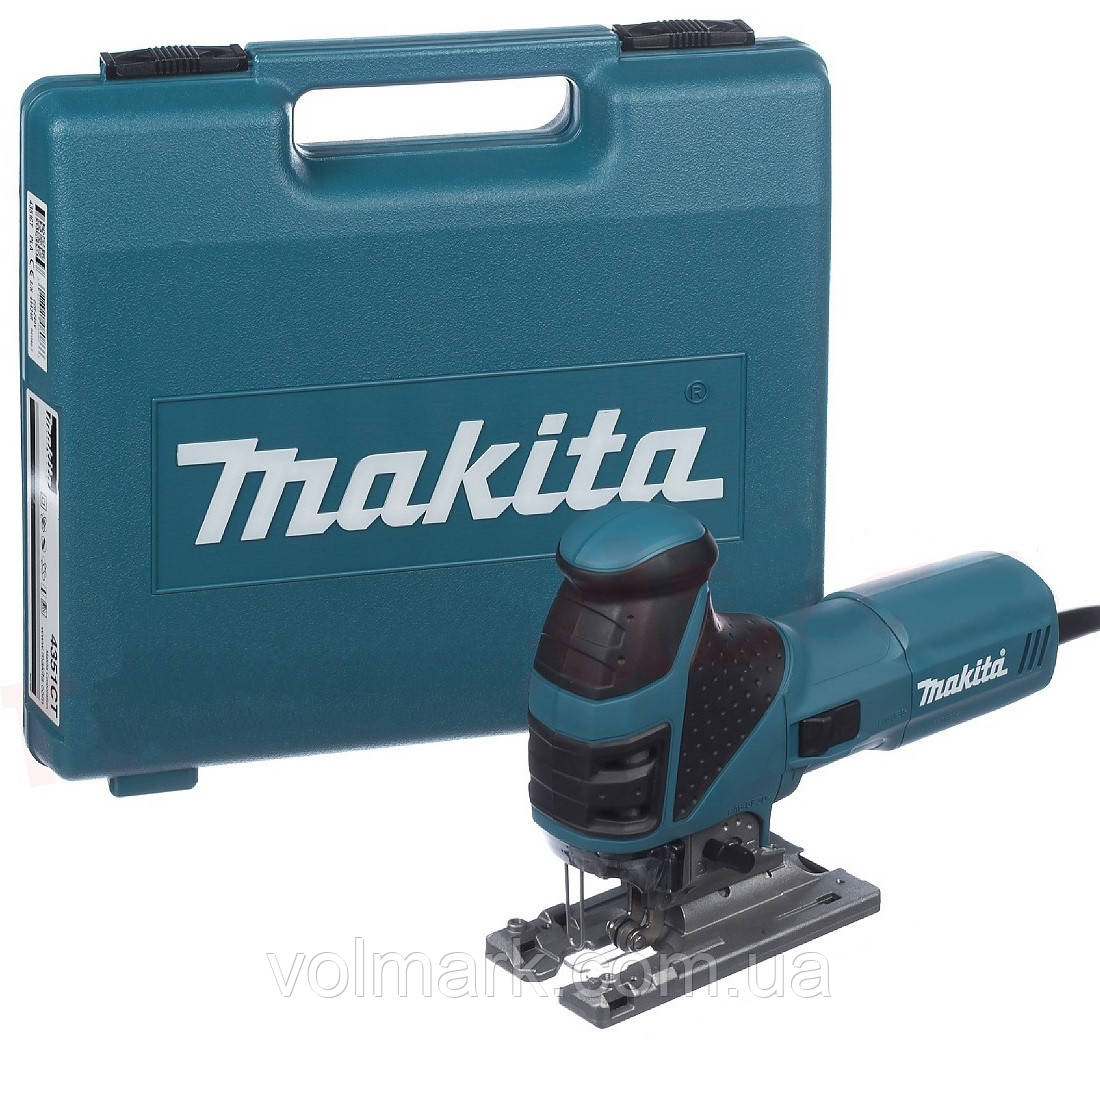 Лобзик с подсветкой Makita 4351 FCT